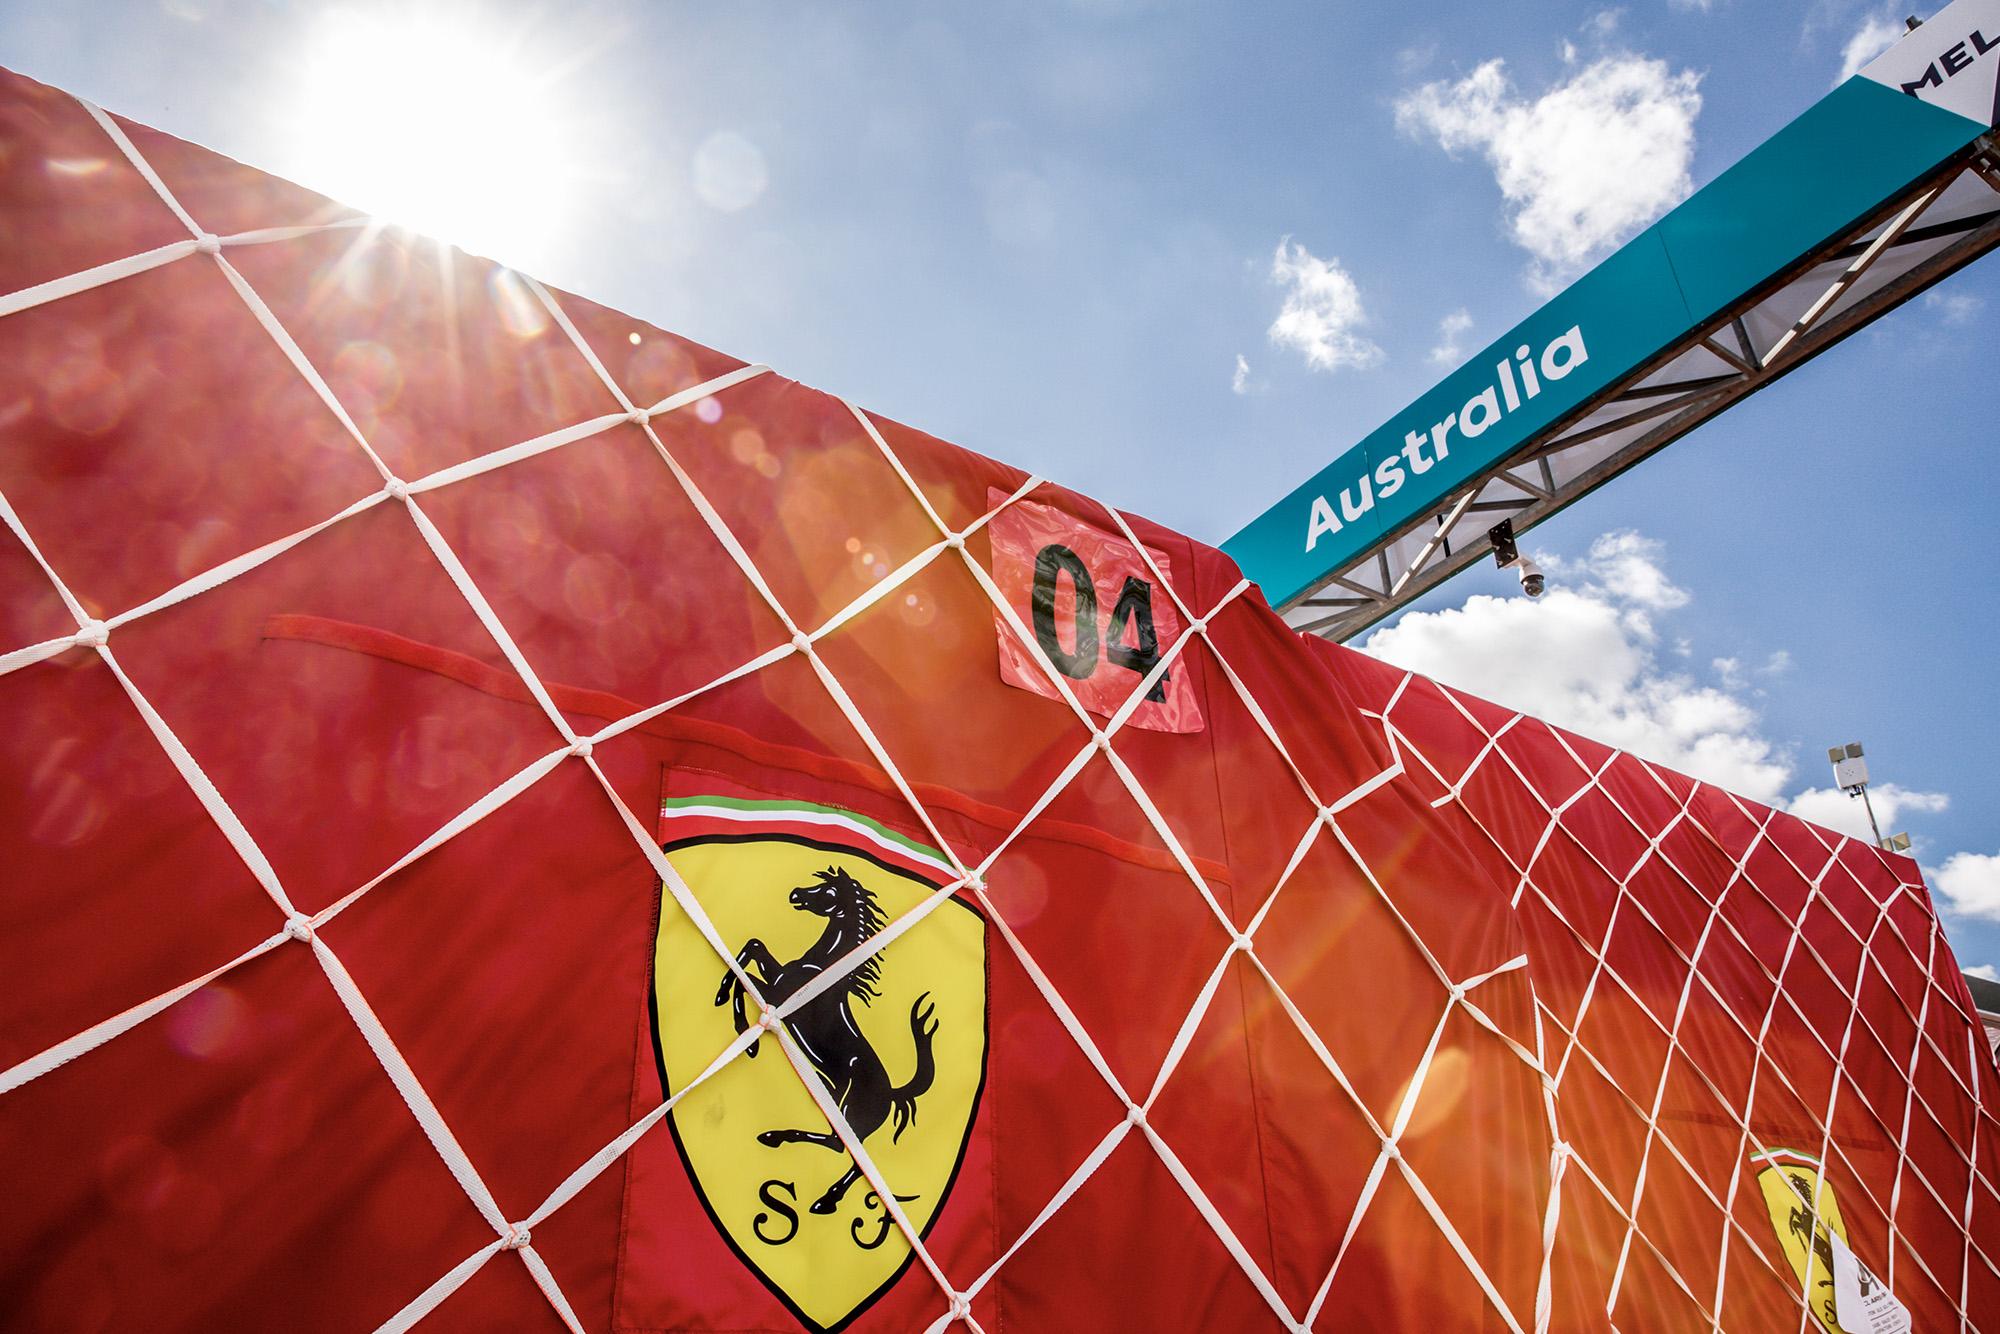 Ferrari equipment at Melbourne for the 2020 Australian Grand Prix